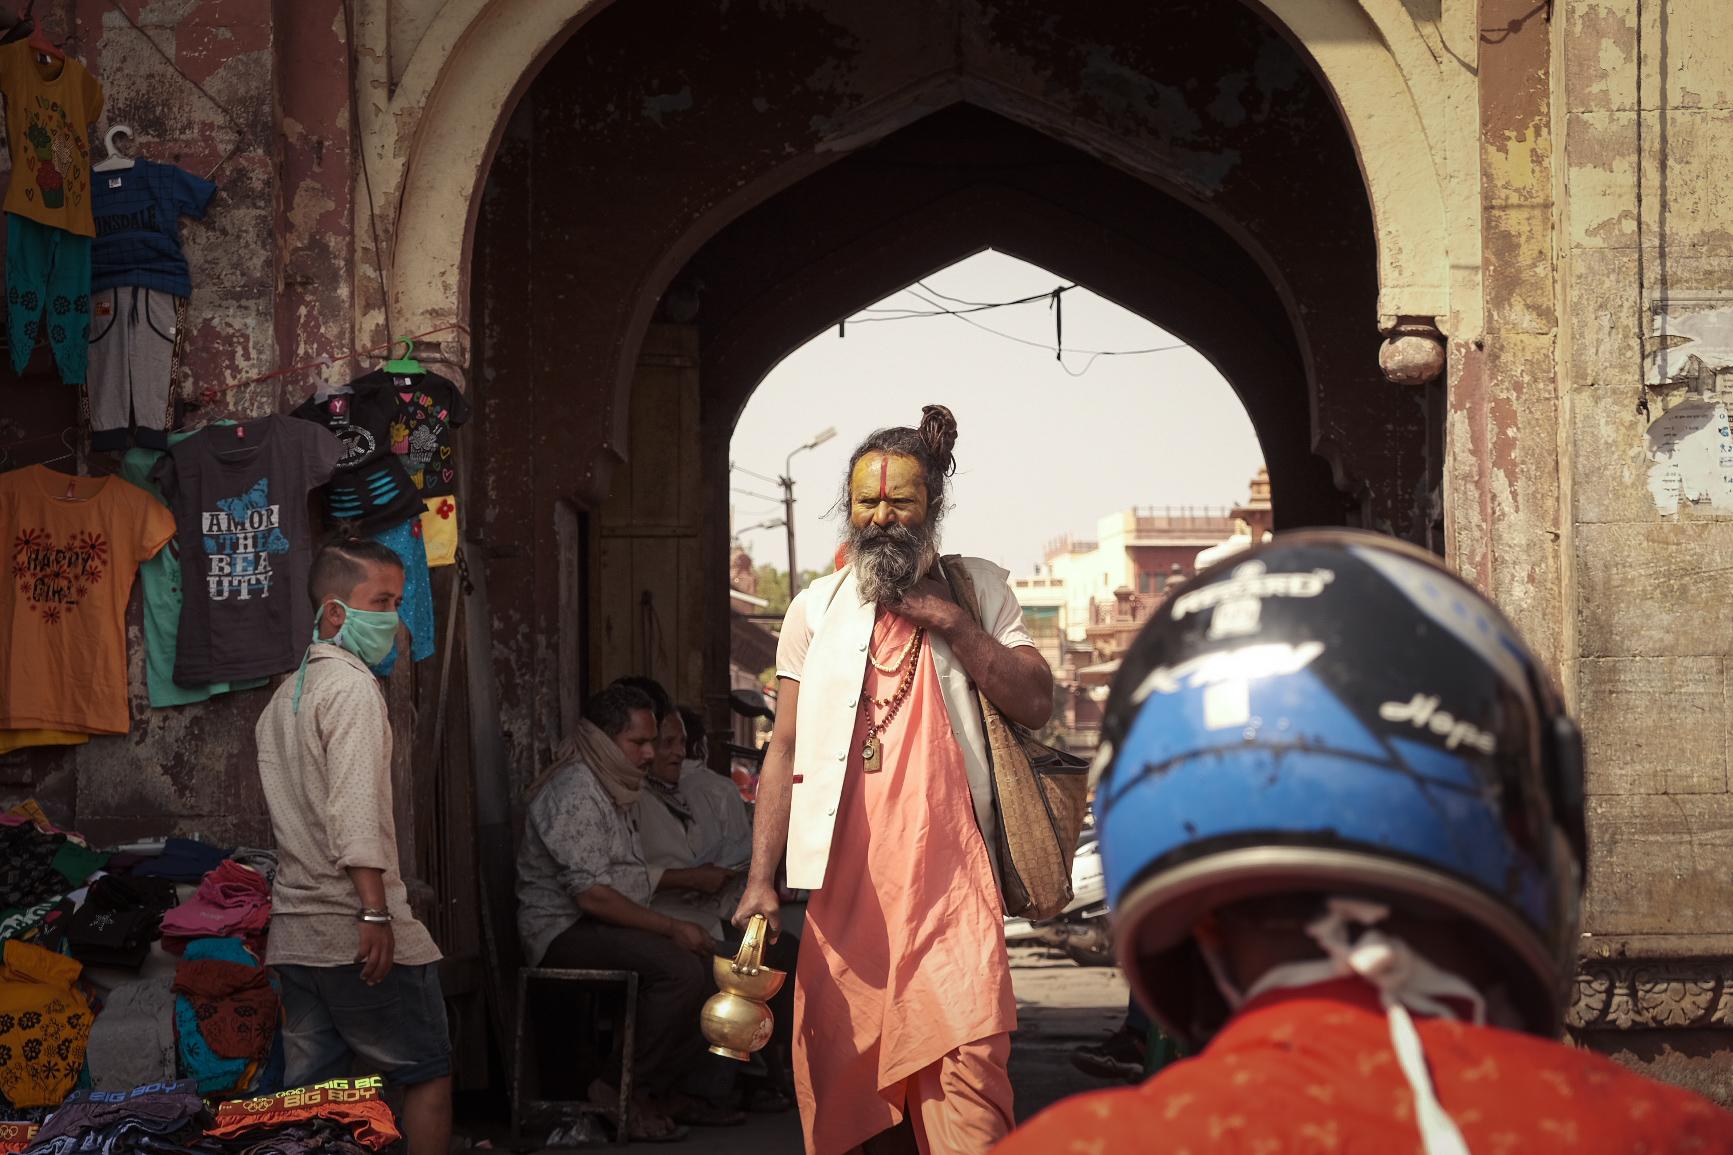 Sadhu Baba Spotted on the Jodhpur Streets